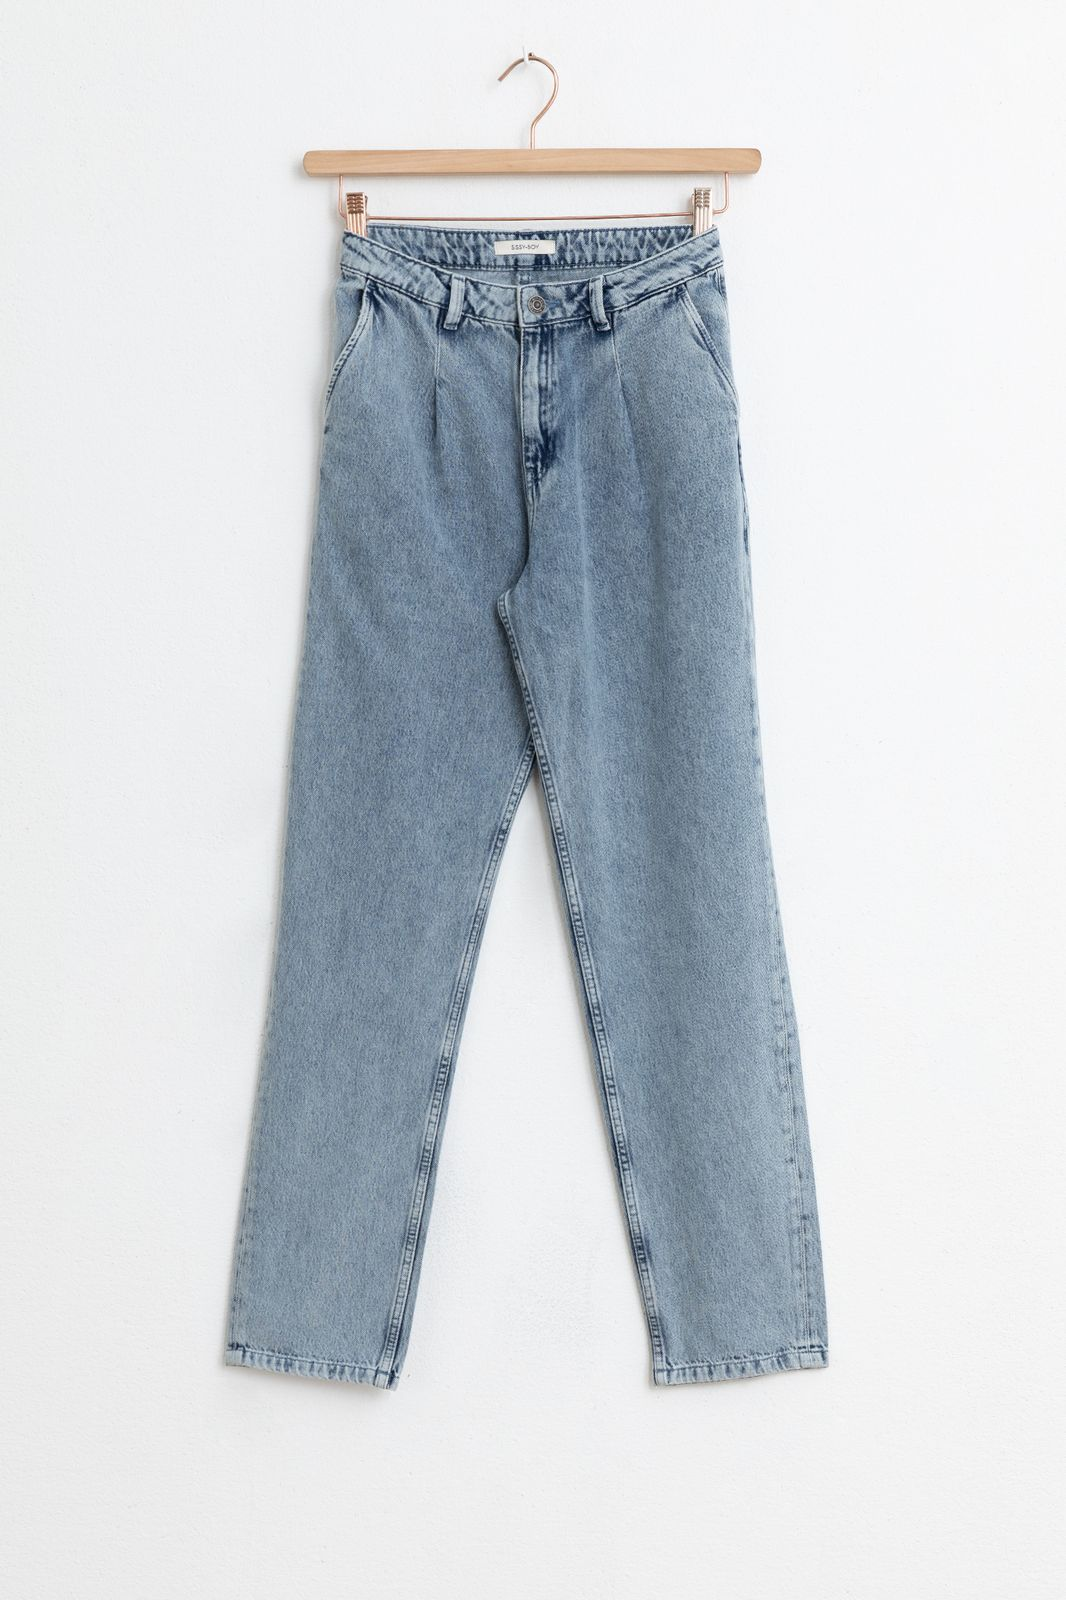 Pleated midrise jeans